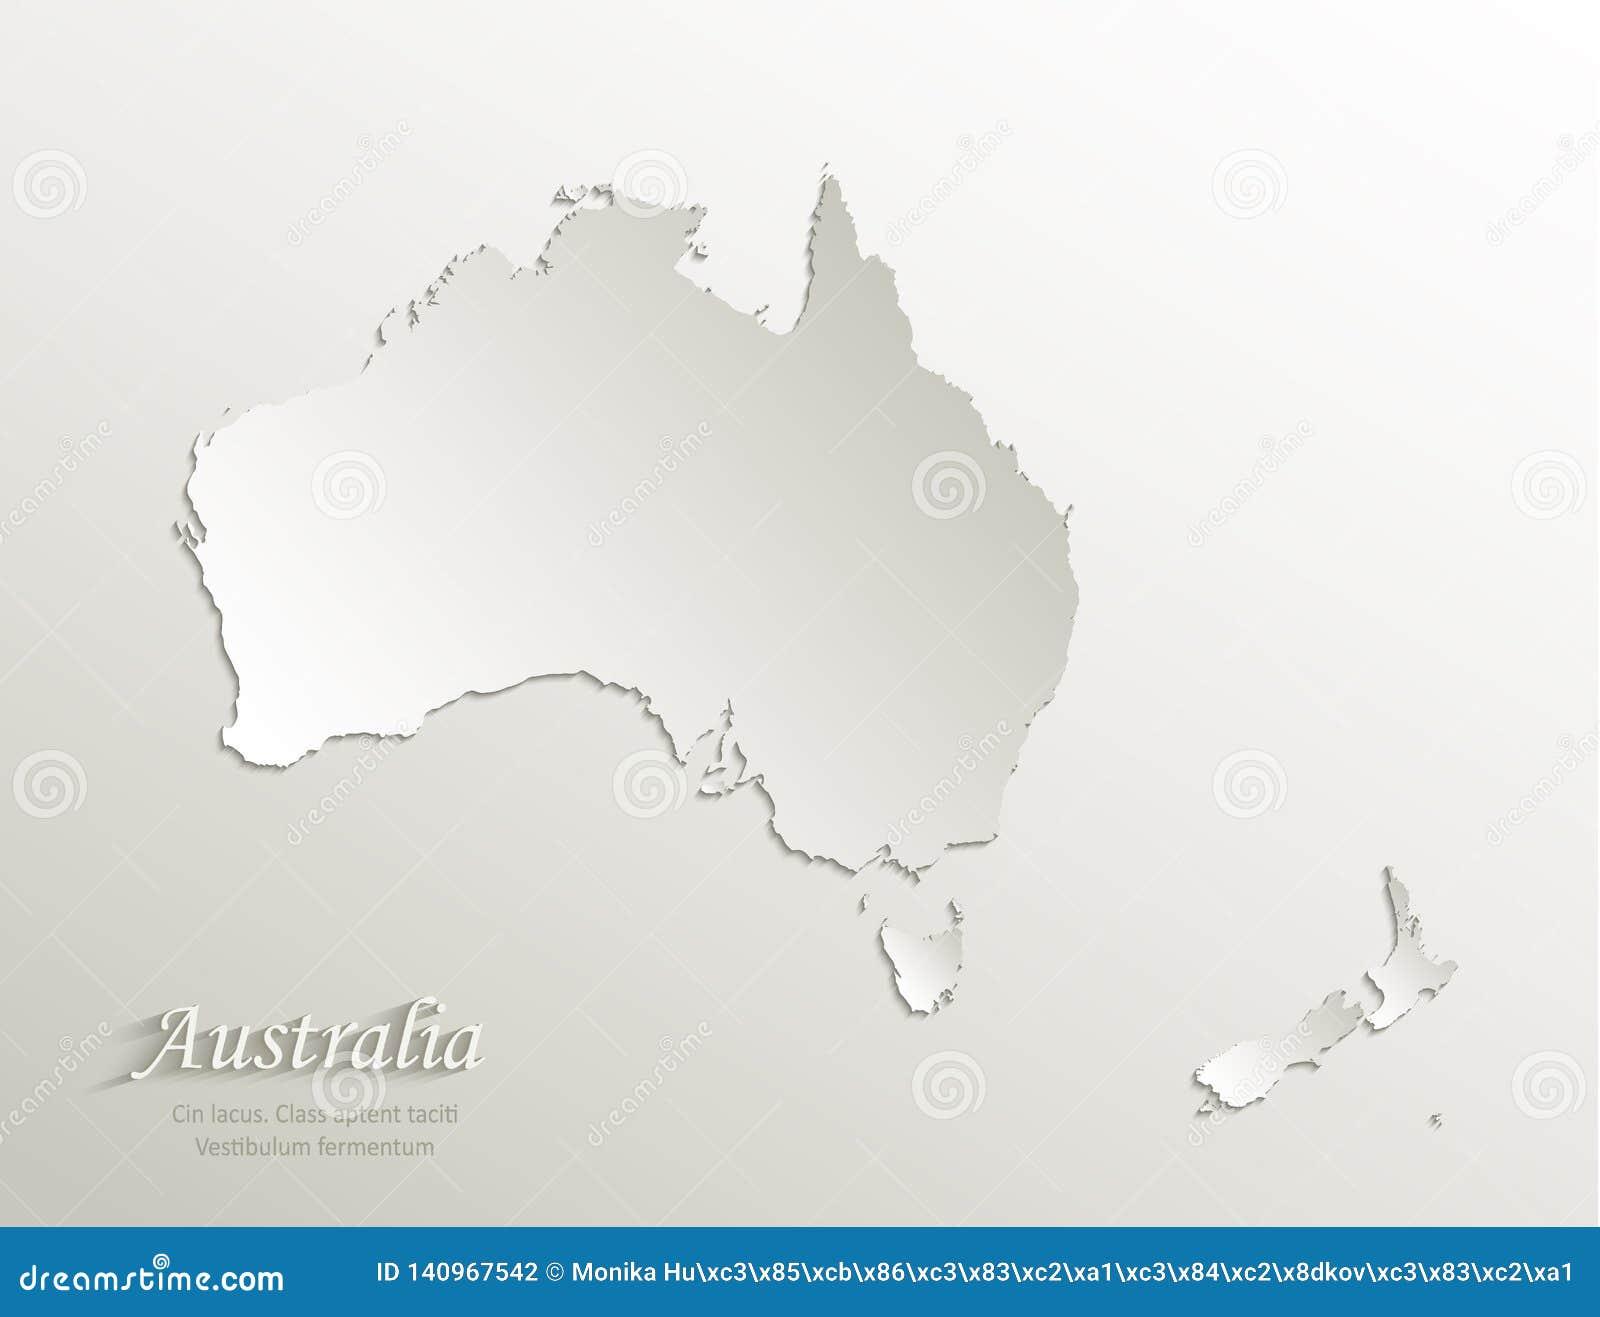 3d Map Of New Zealand.Australia Continent Map New Zealand Natural Paper 3d Card Stock